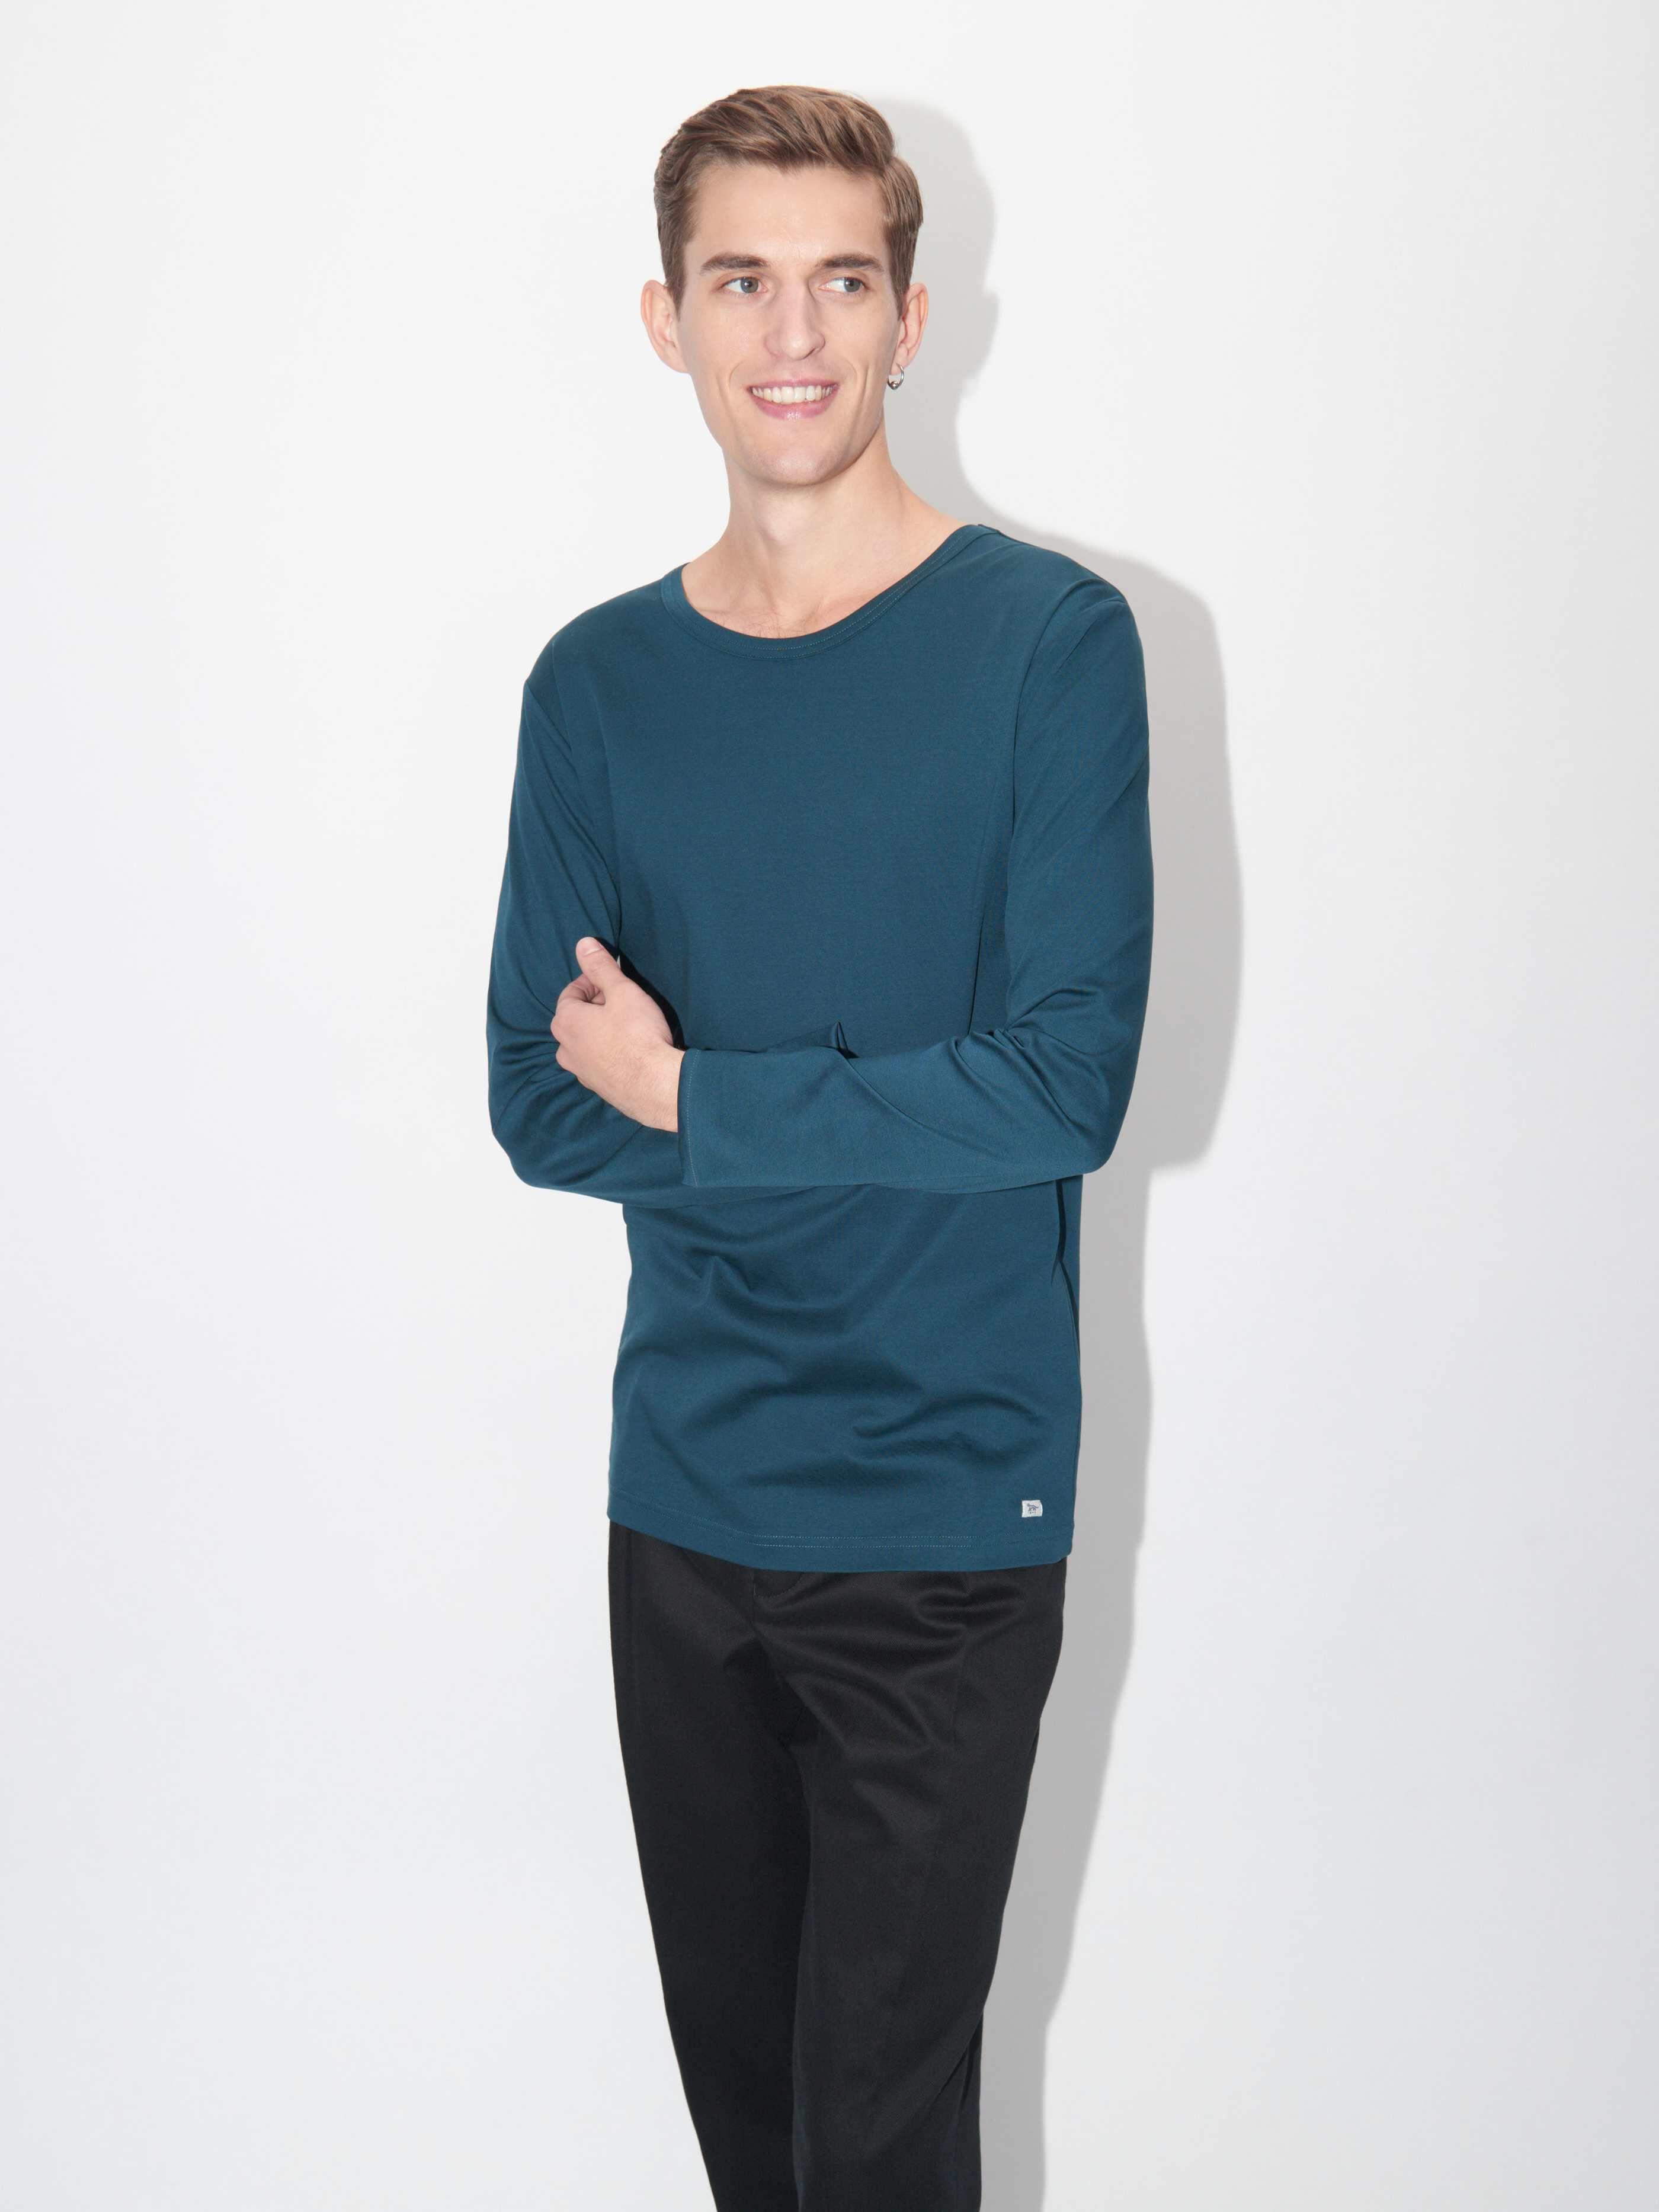 Abalone T Shirt T shirts Online kaufen